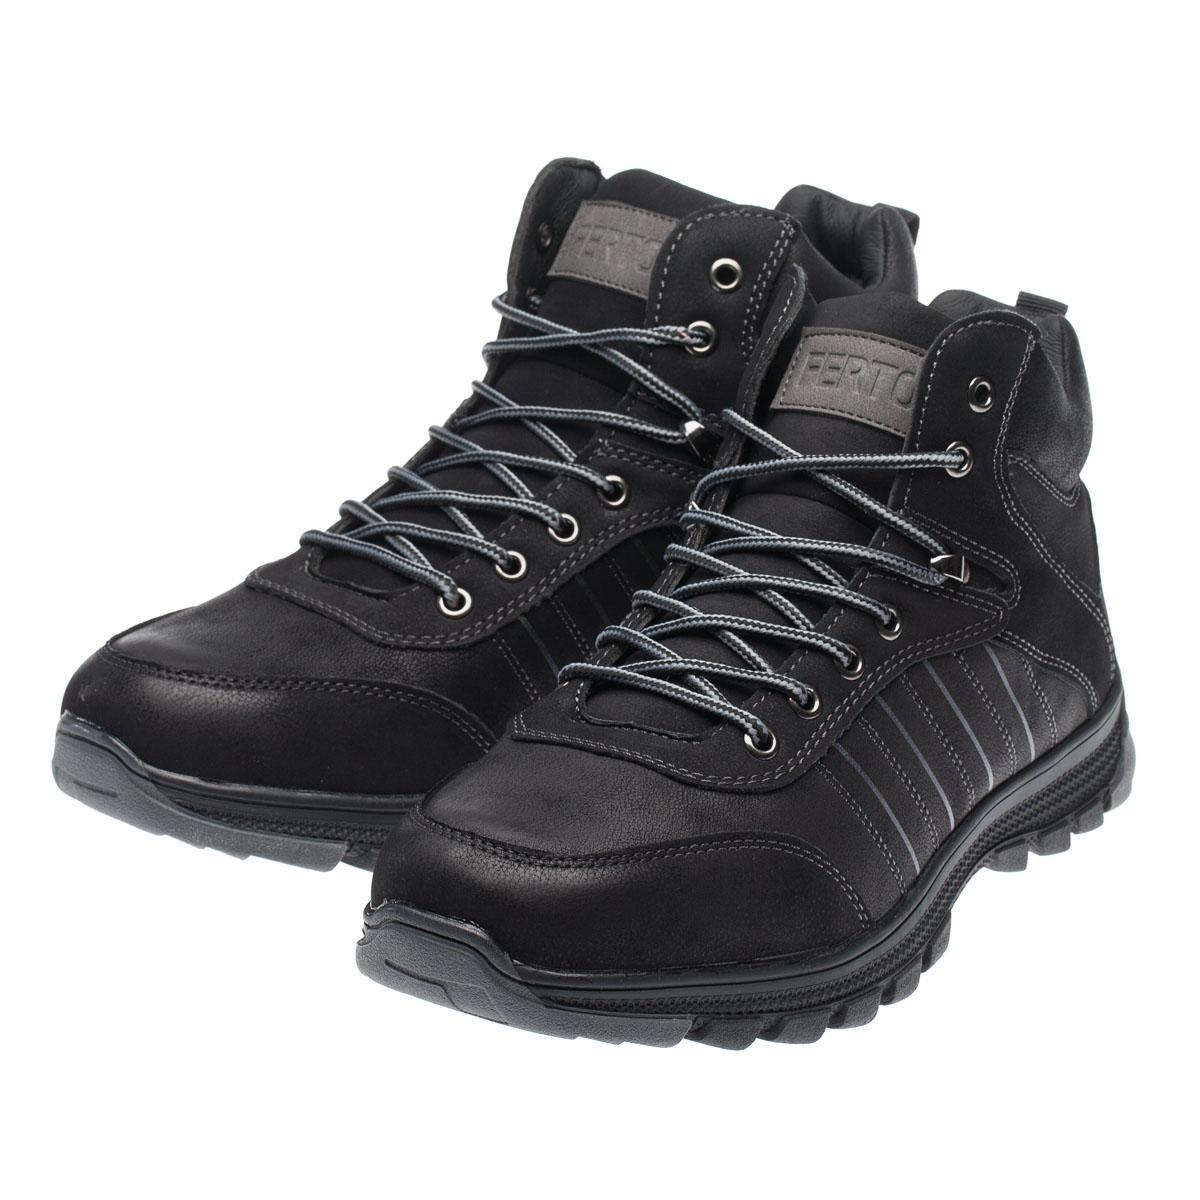 Ботинки зимние FERTO, KLF 1851-1